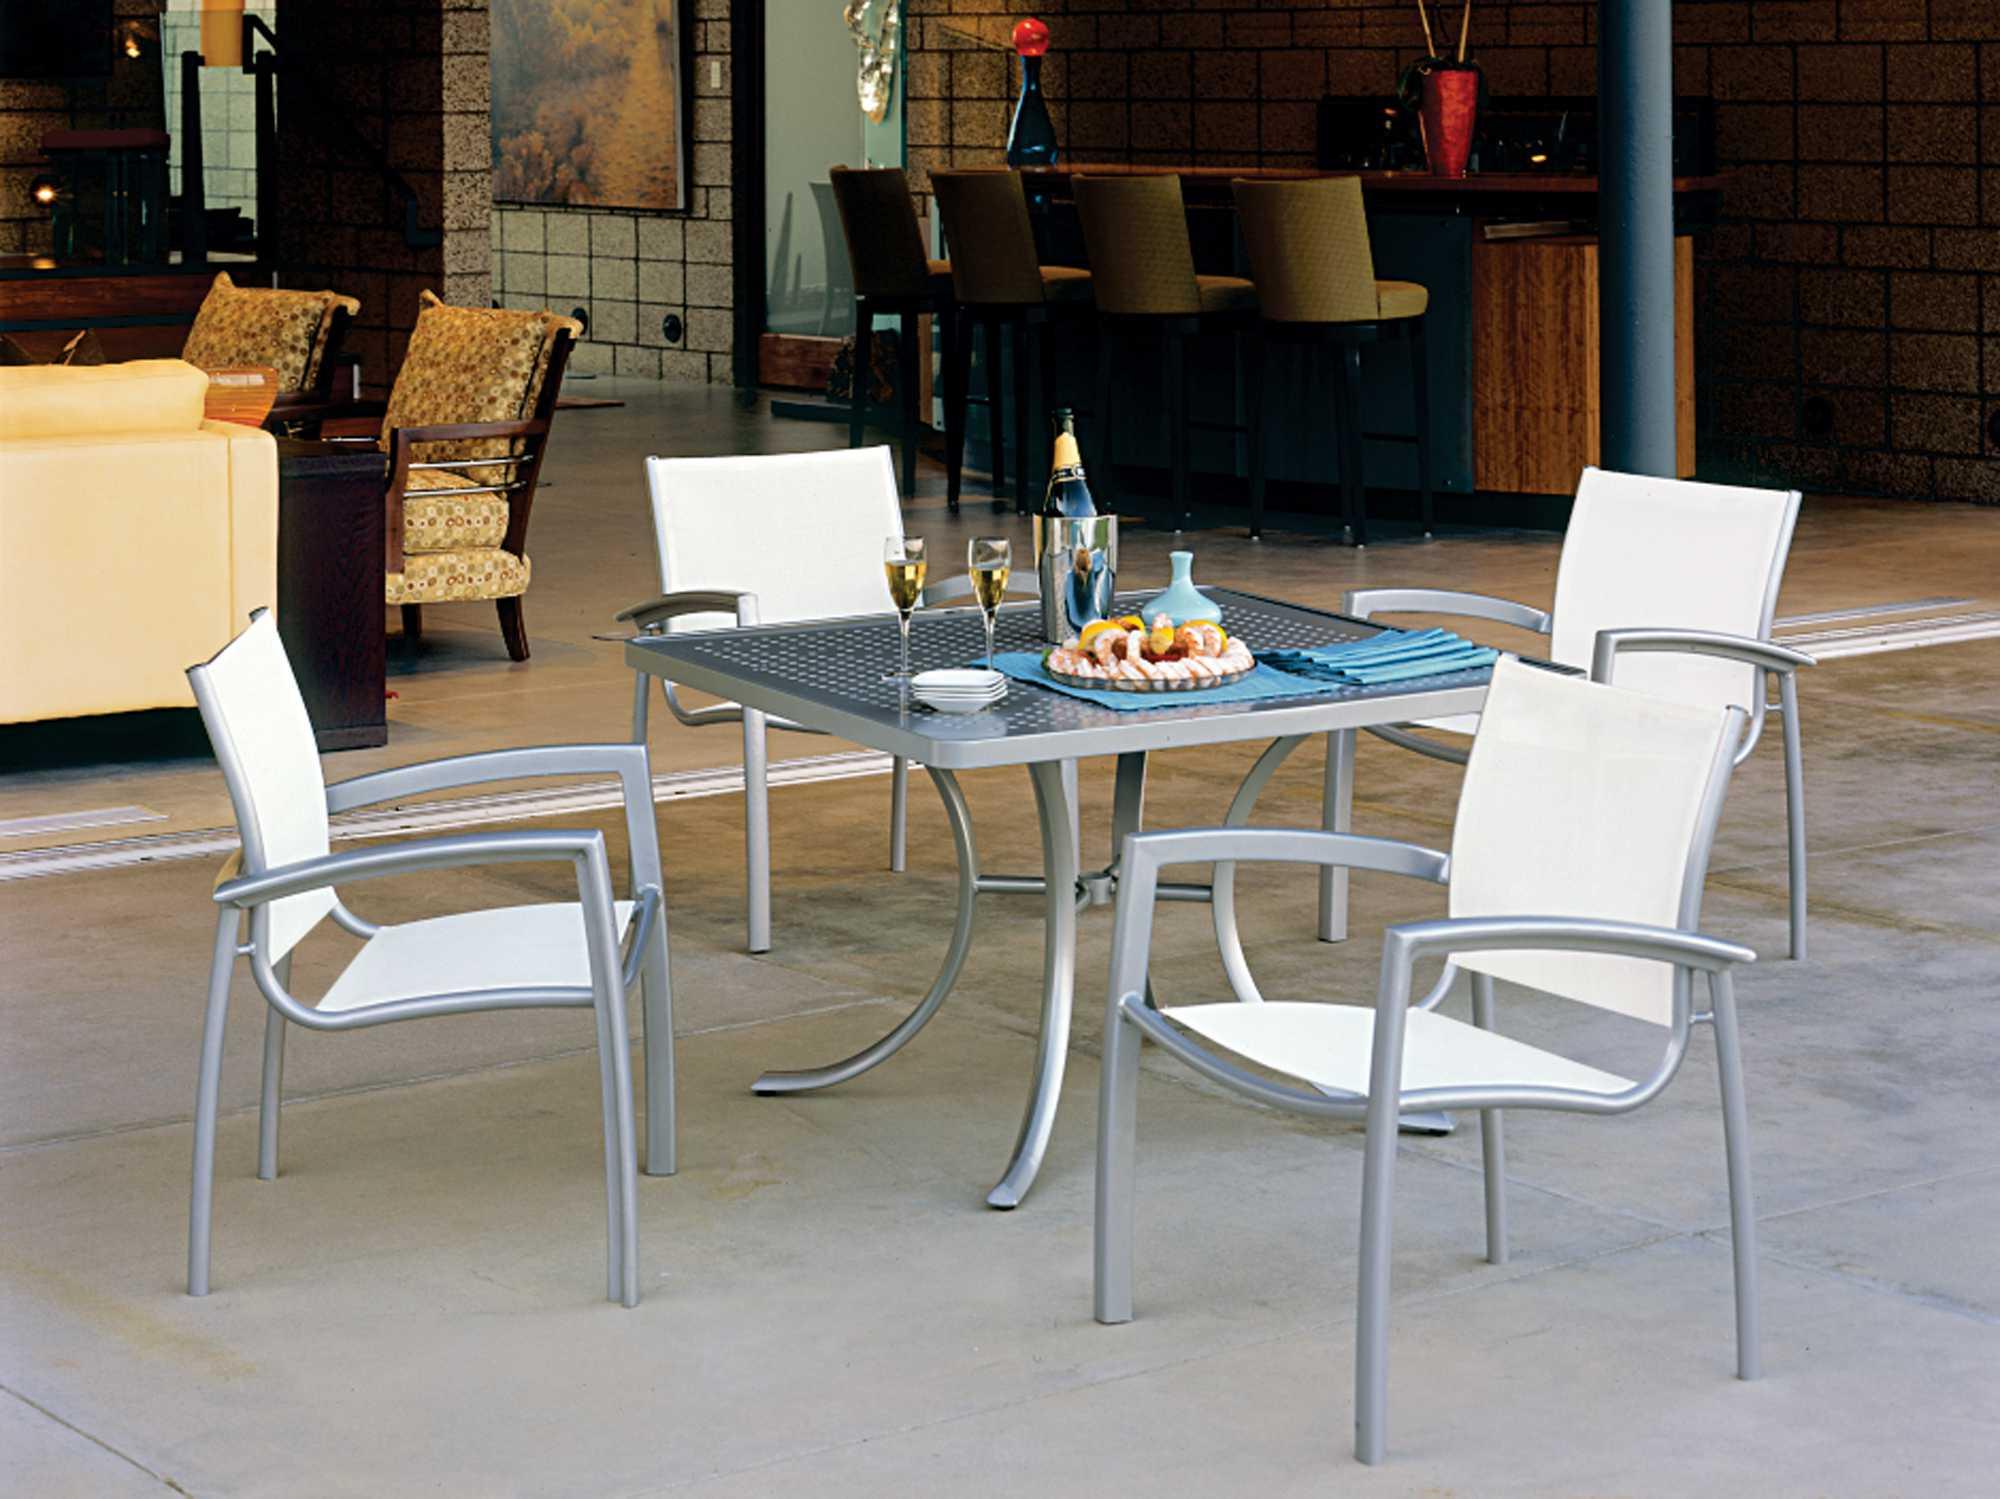 Tropitone Veer Sling Cast Aluminum Dining Chair - Tropitone outdoor furniture